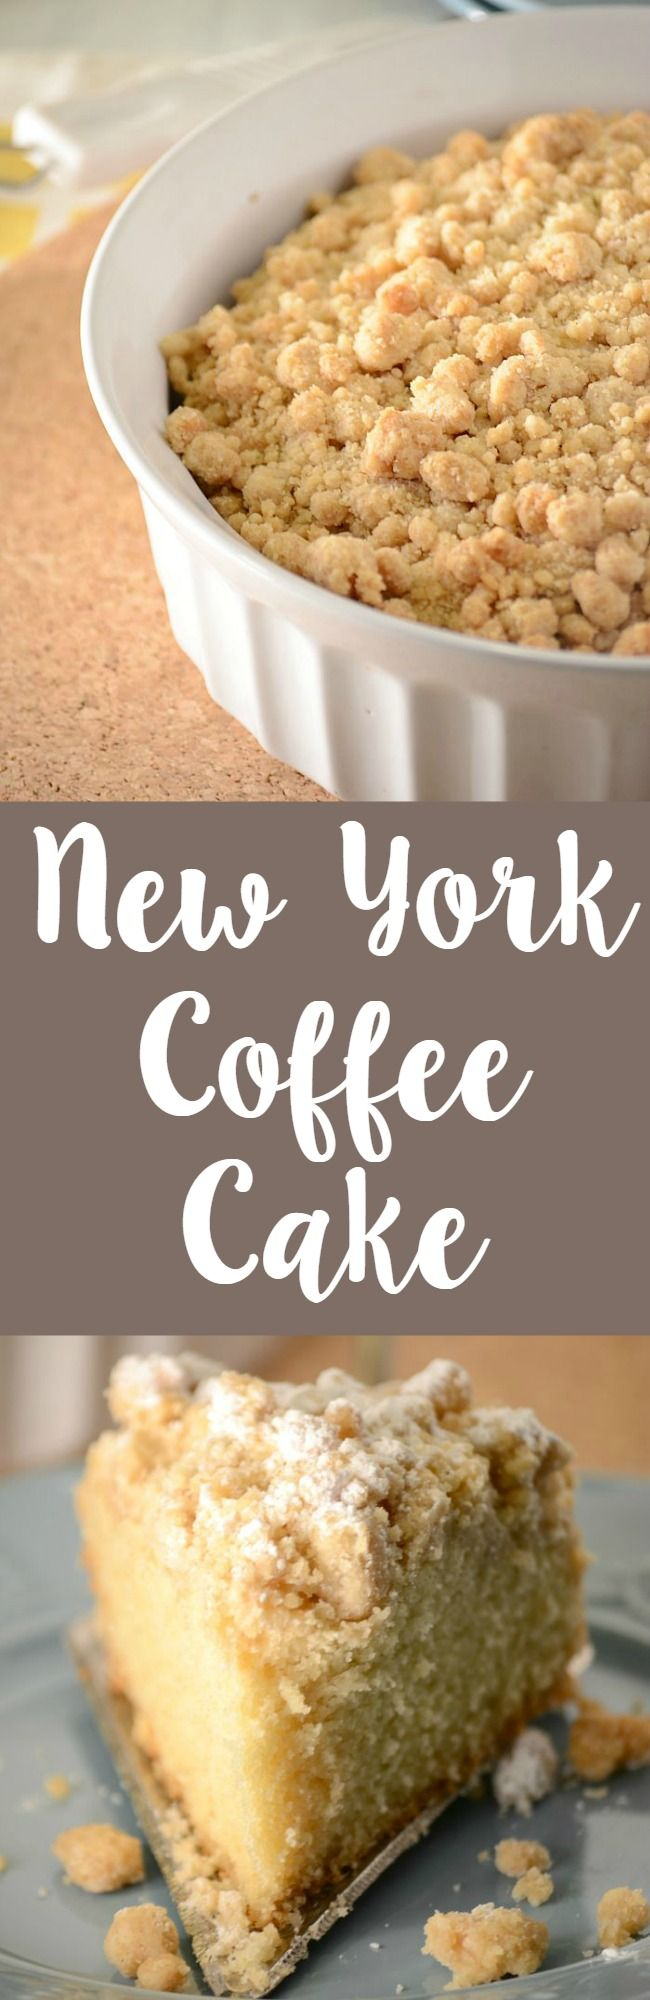 New York style coffee cake recipe